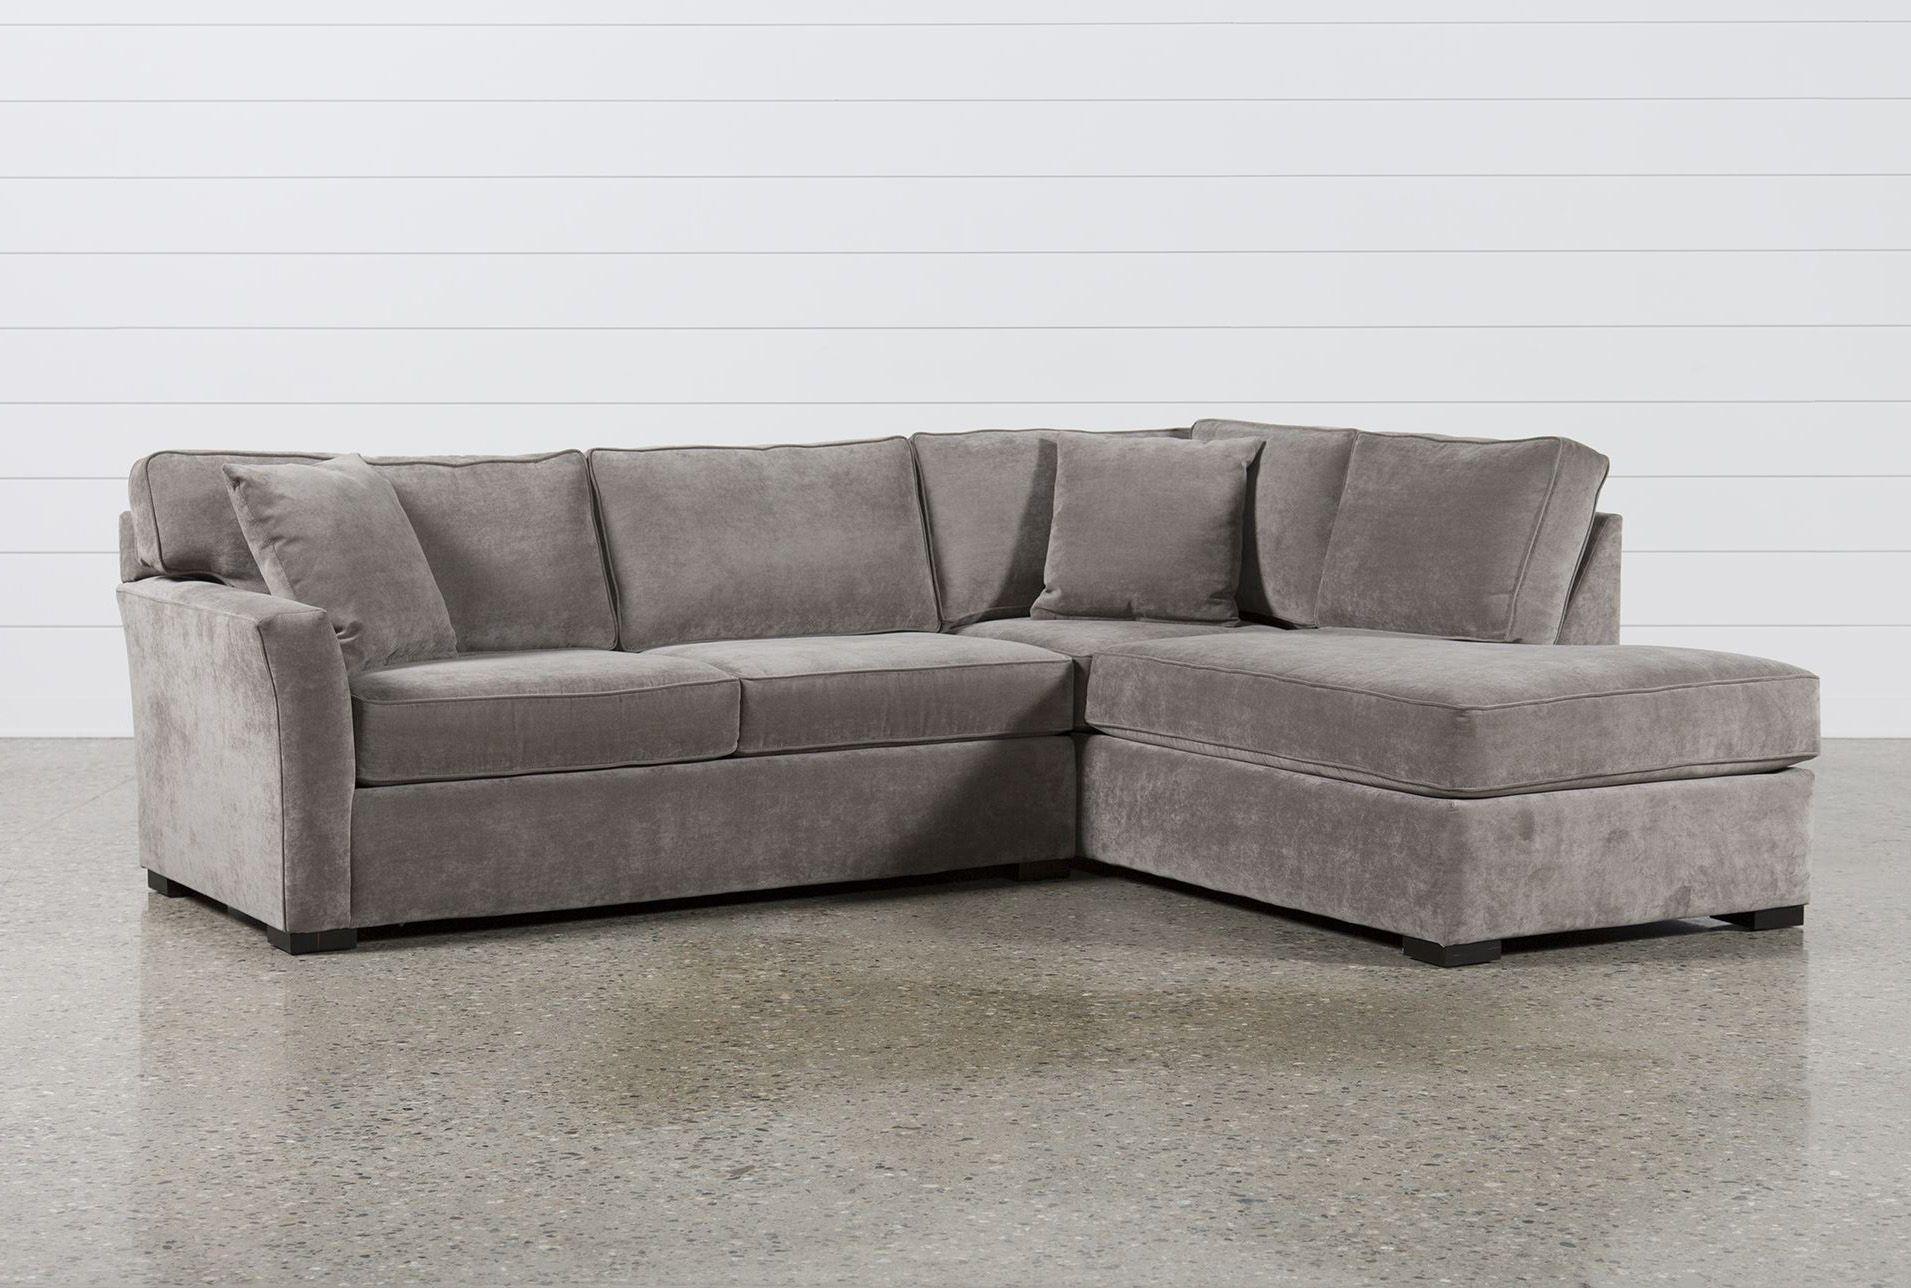 Terrific Aspen 2 Piece Sleeper Sectional W Raf Chaise In 2019 Short Links Chair Design For Home Short Linksinfo